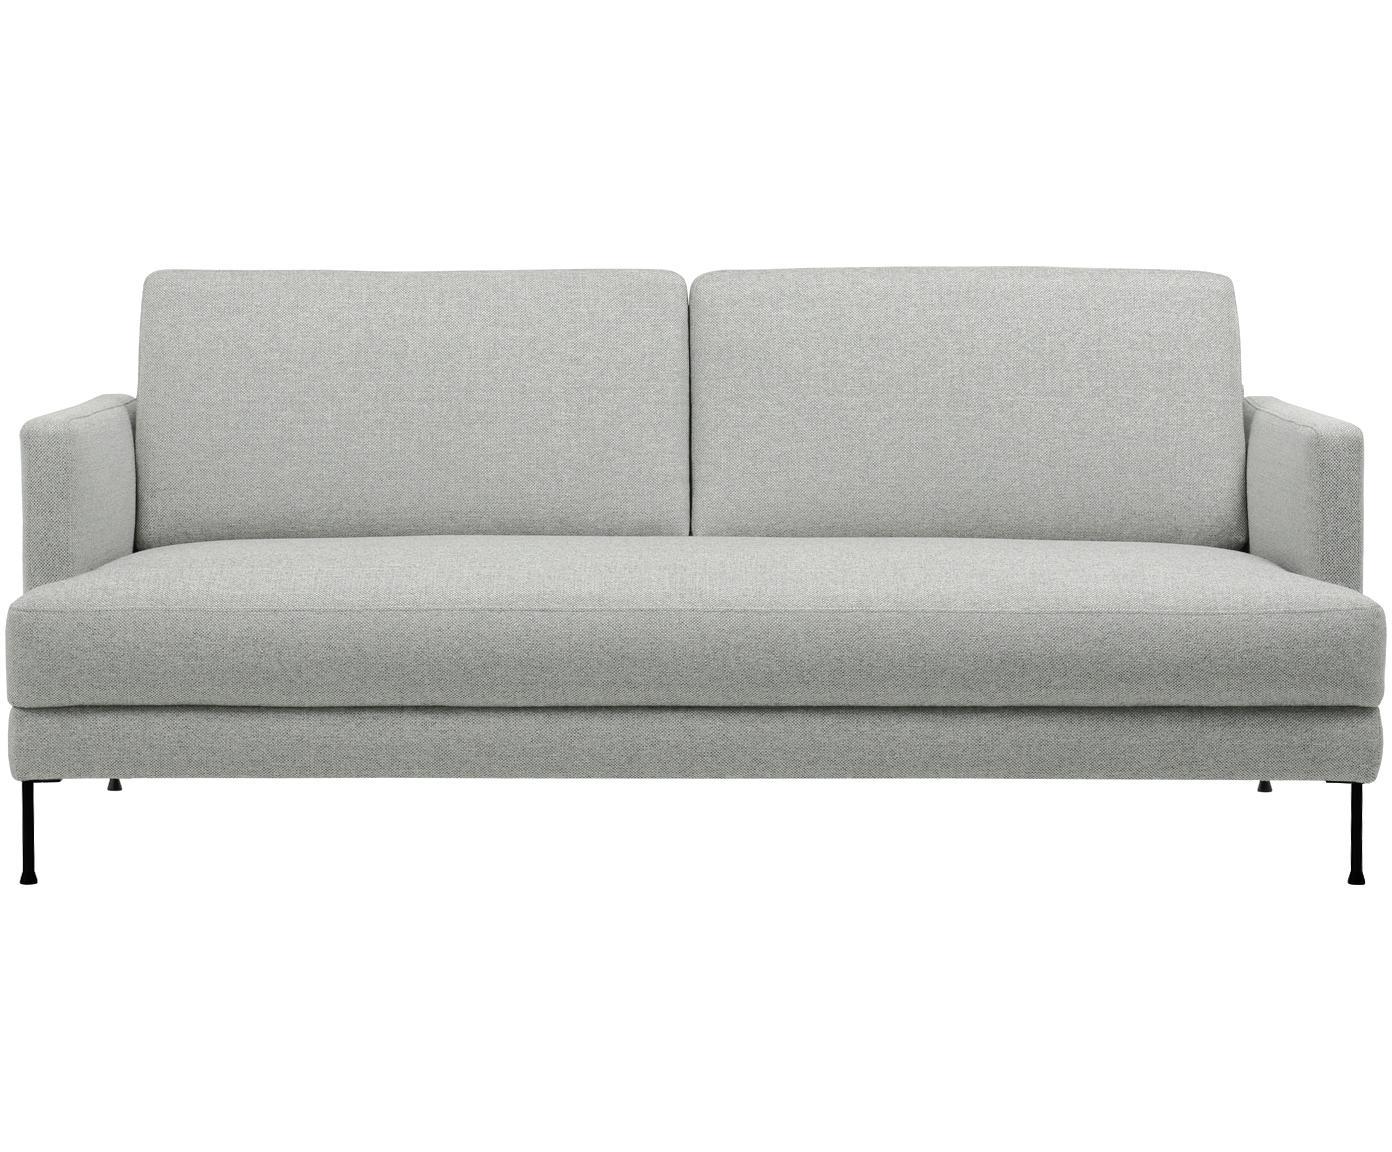 Sofa Fluente (3-Sitzer), Bezug: Polyester 45.000 Scheuert, Gestell: Massives Kiefernholz, Webstoff Hellgrau, 197 x 85 cm